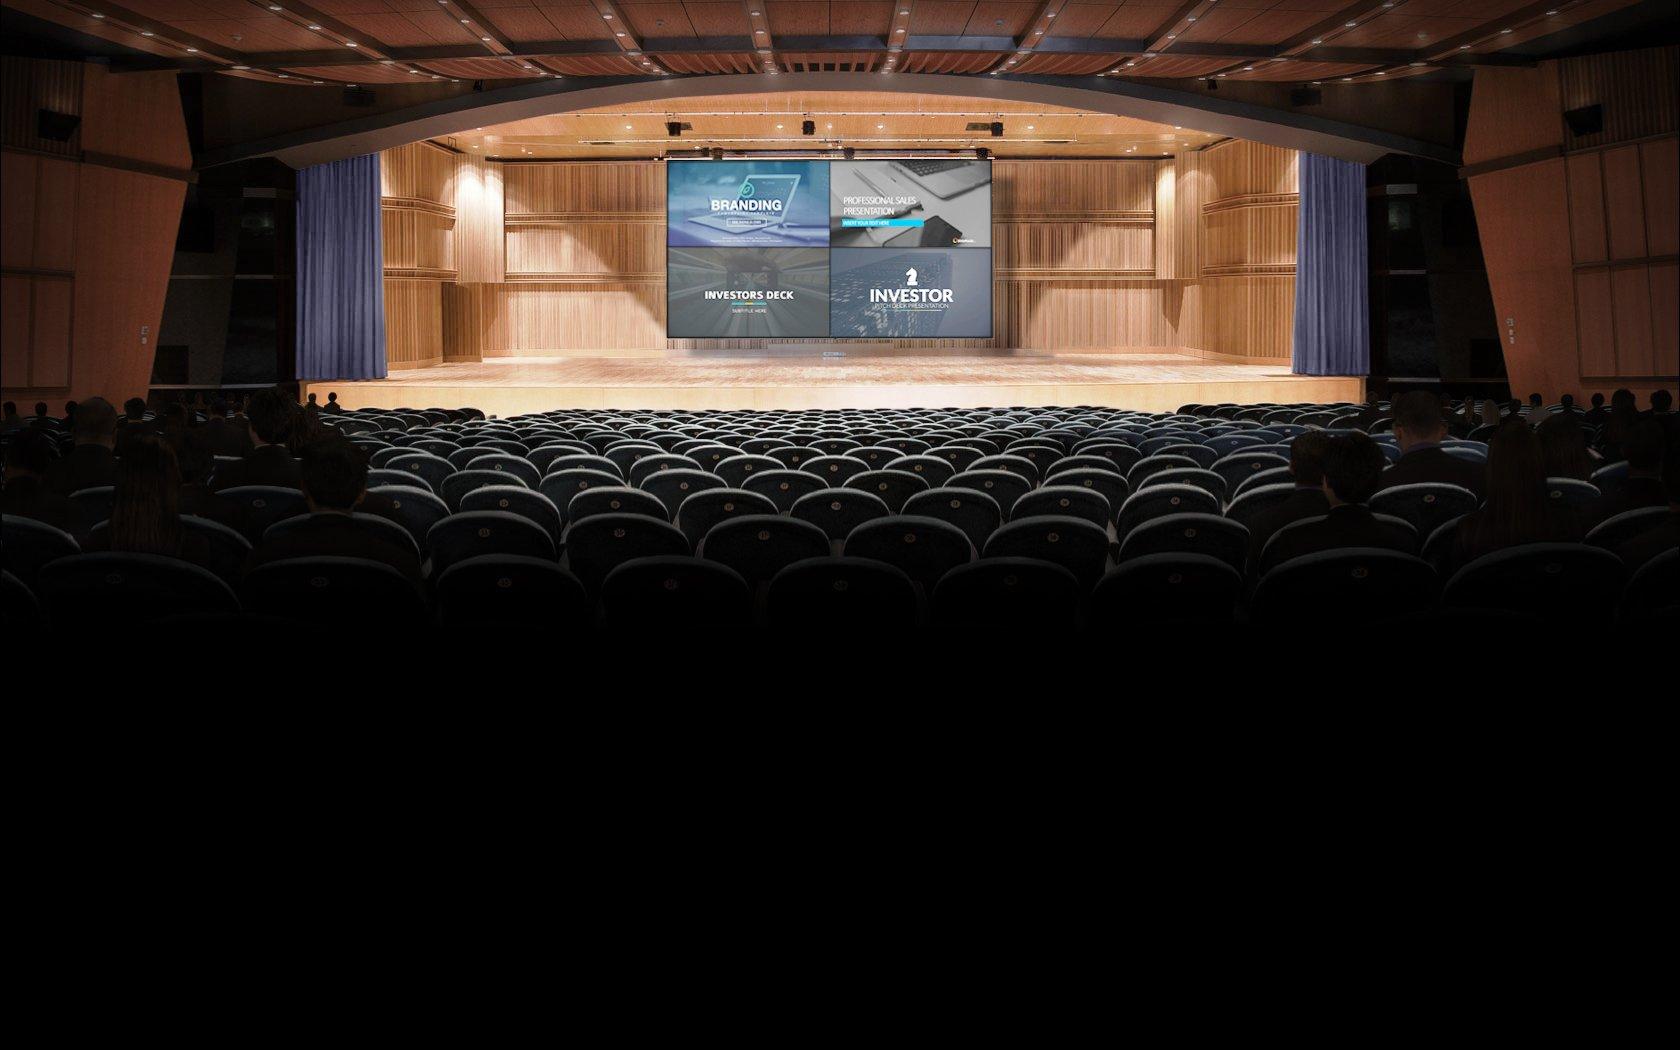 auditorium E screen 325 x 180